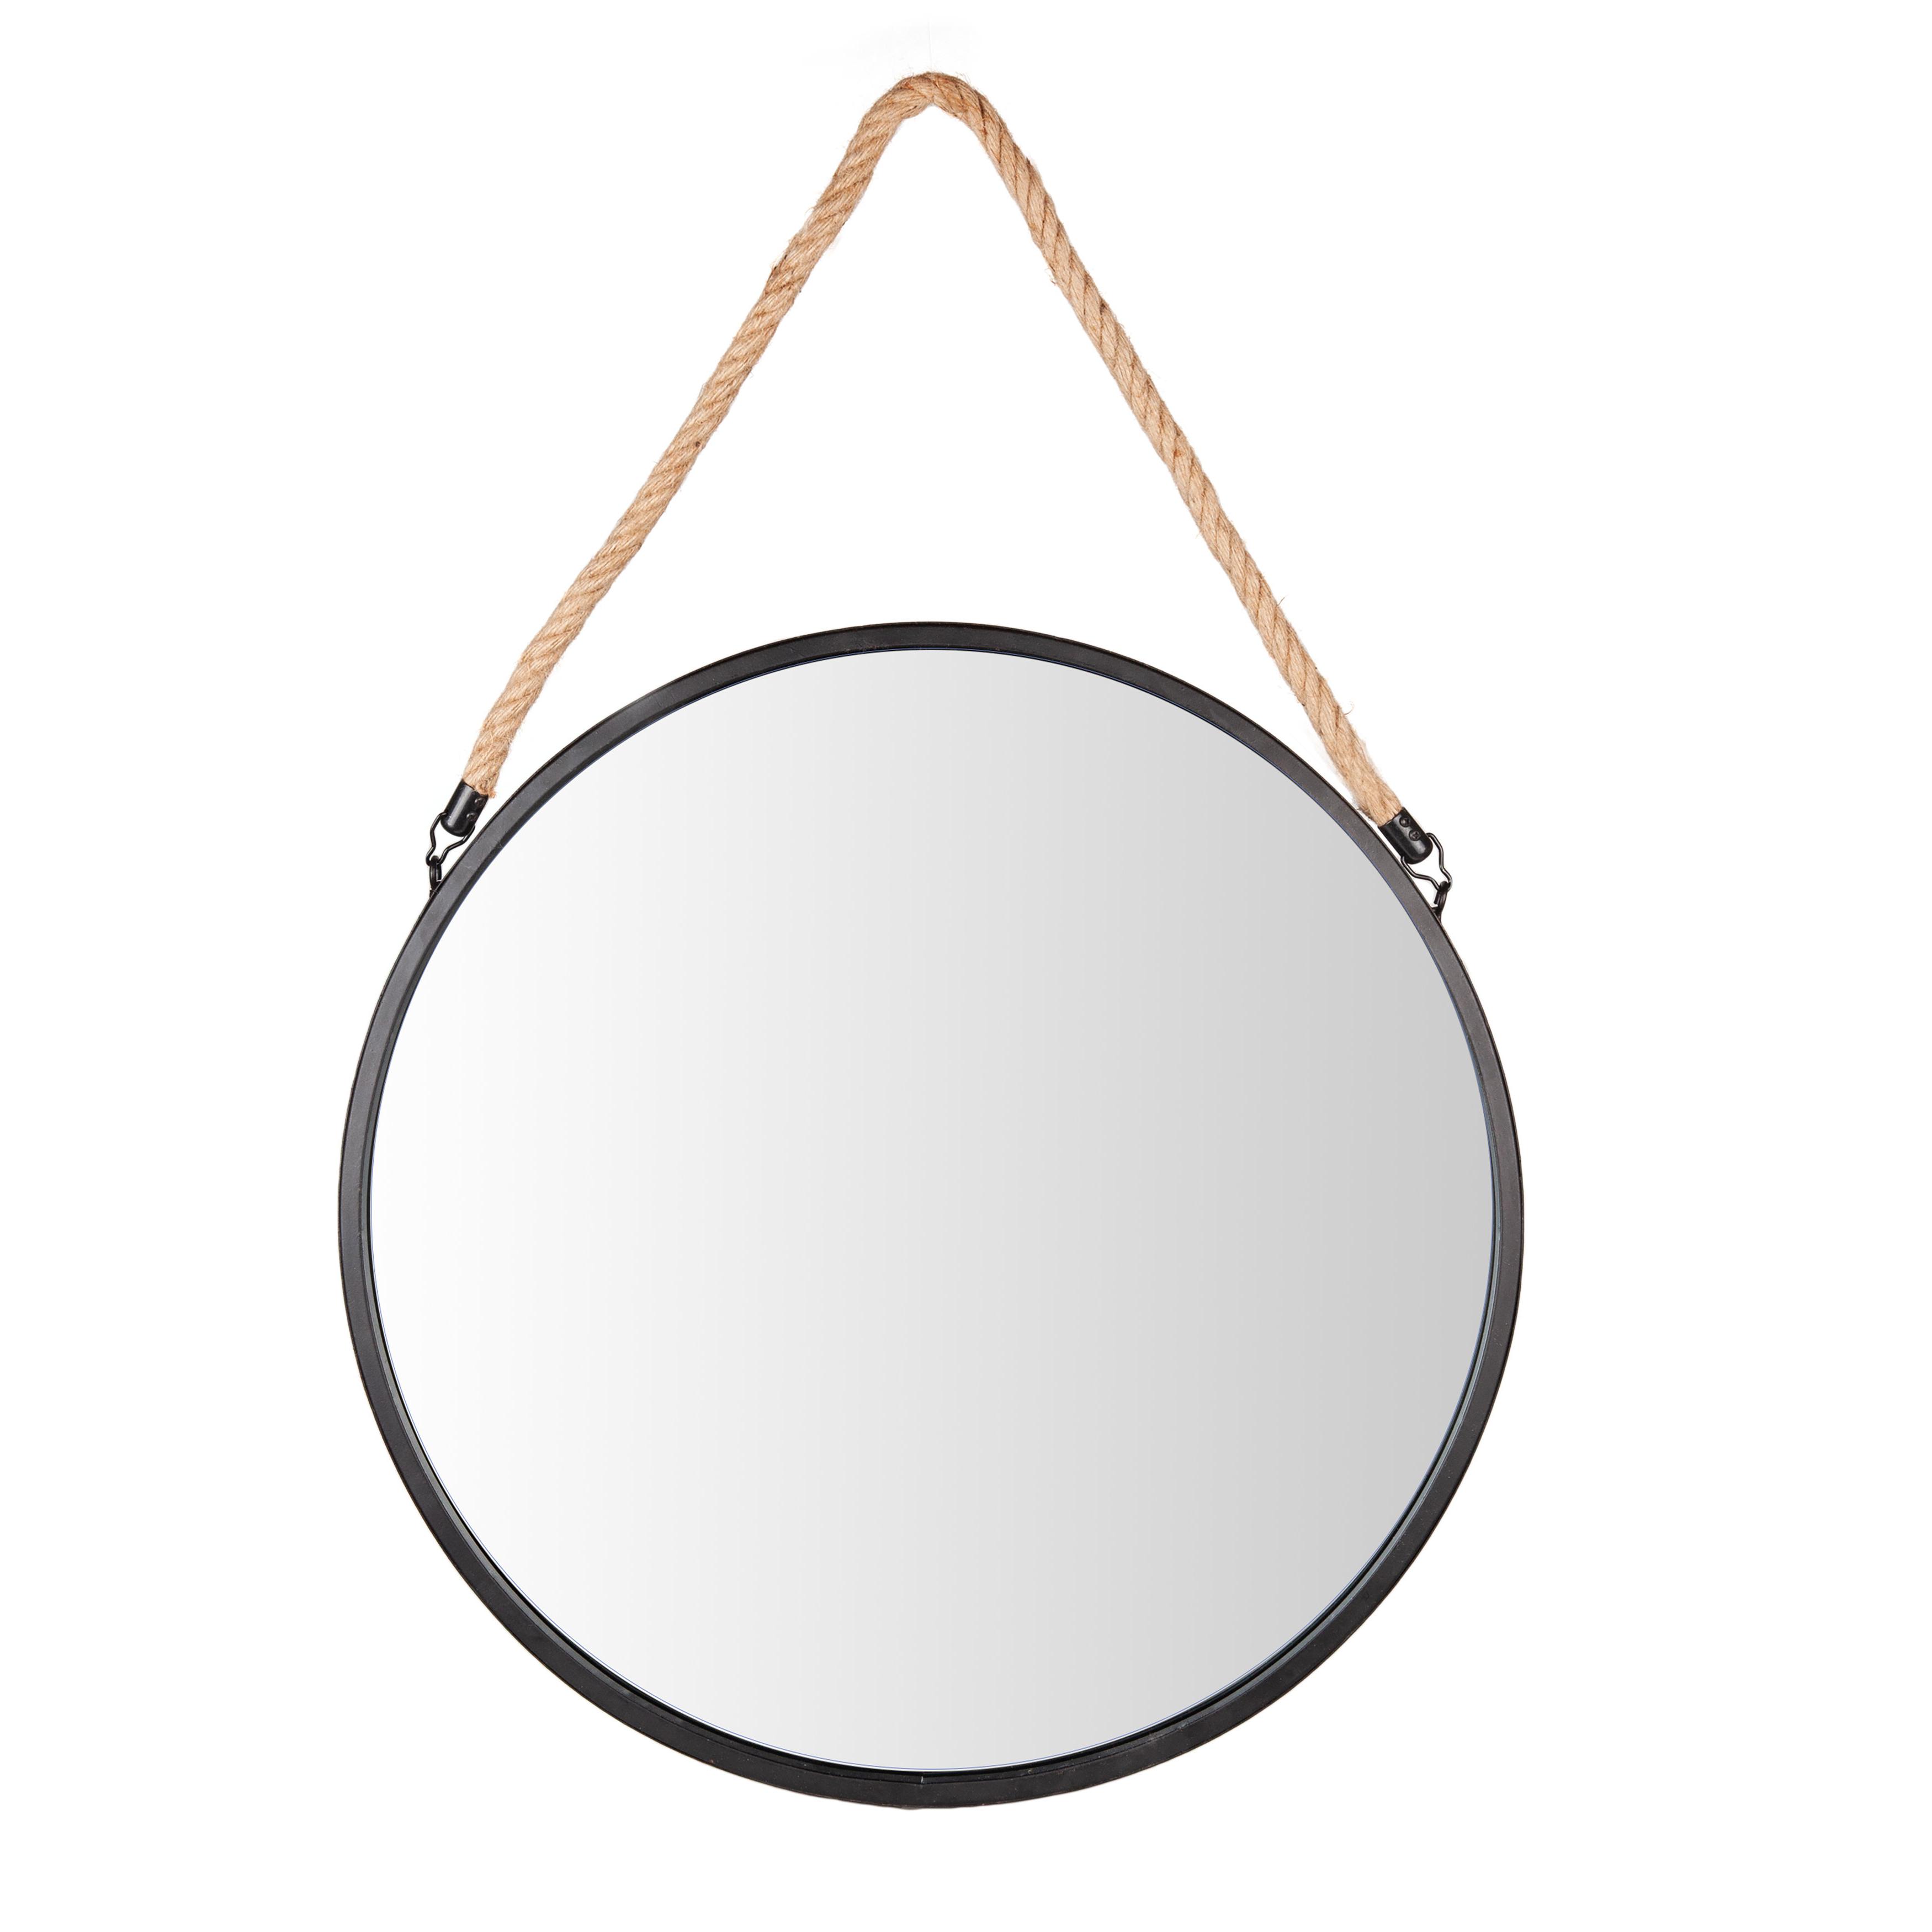 Trendy Rumfelt Decorative Round Metal Wall Mirror Pertaining To Round Metal Wall Mirrors (View 8 of 20)